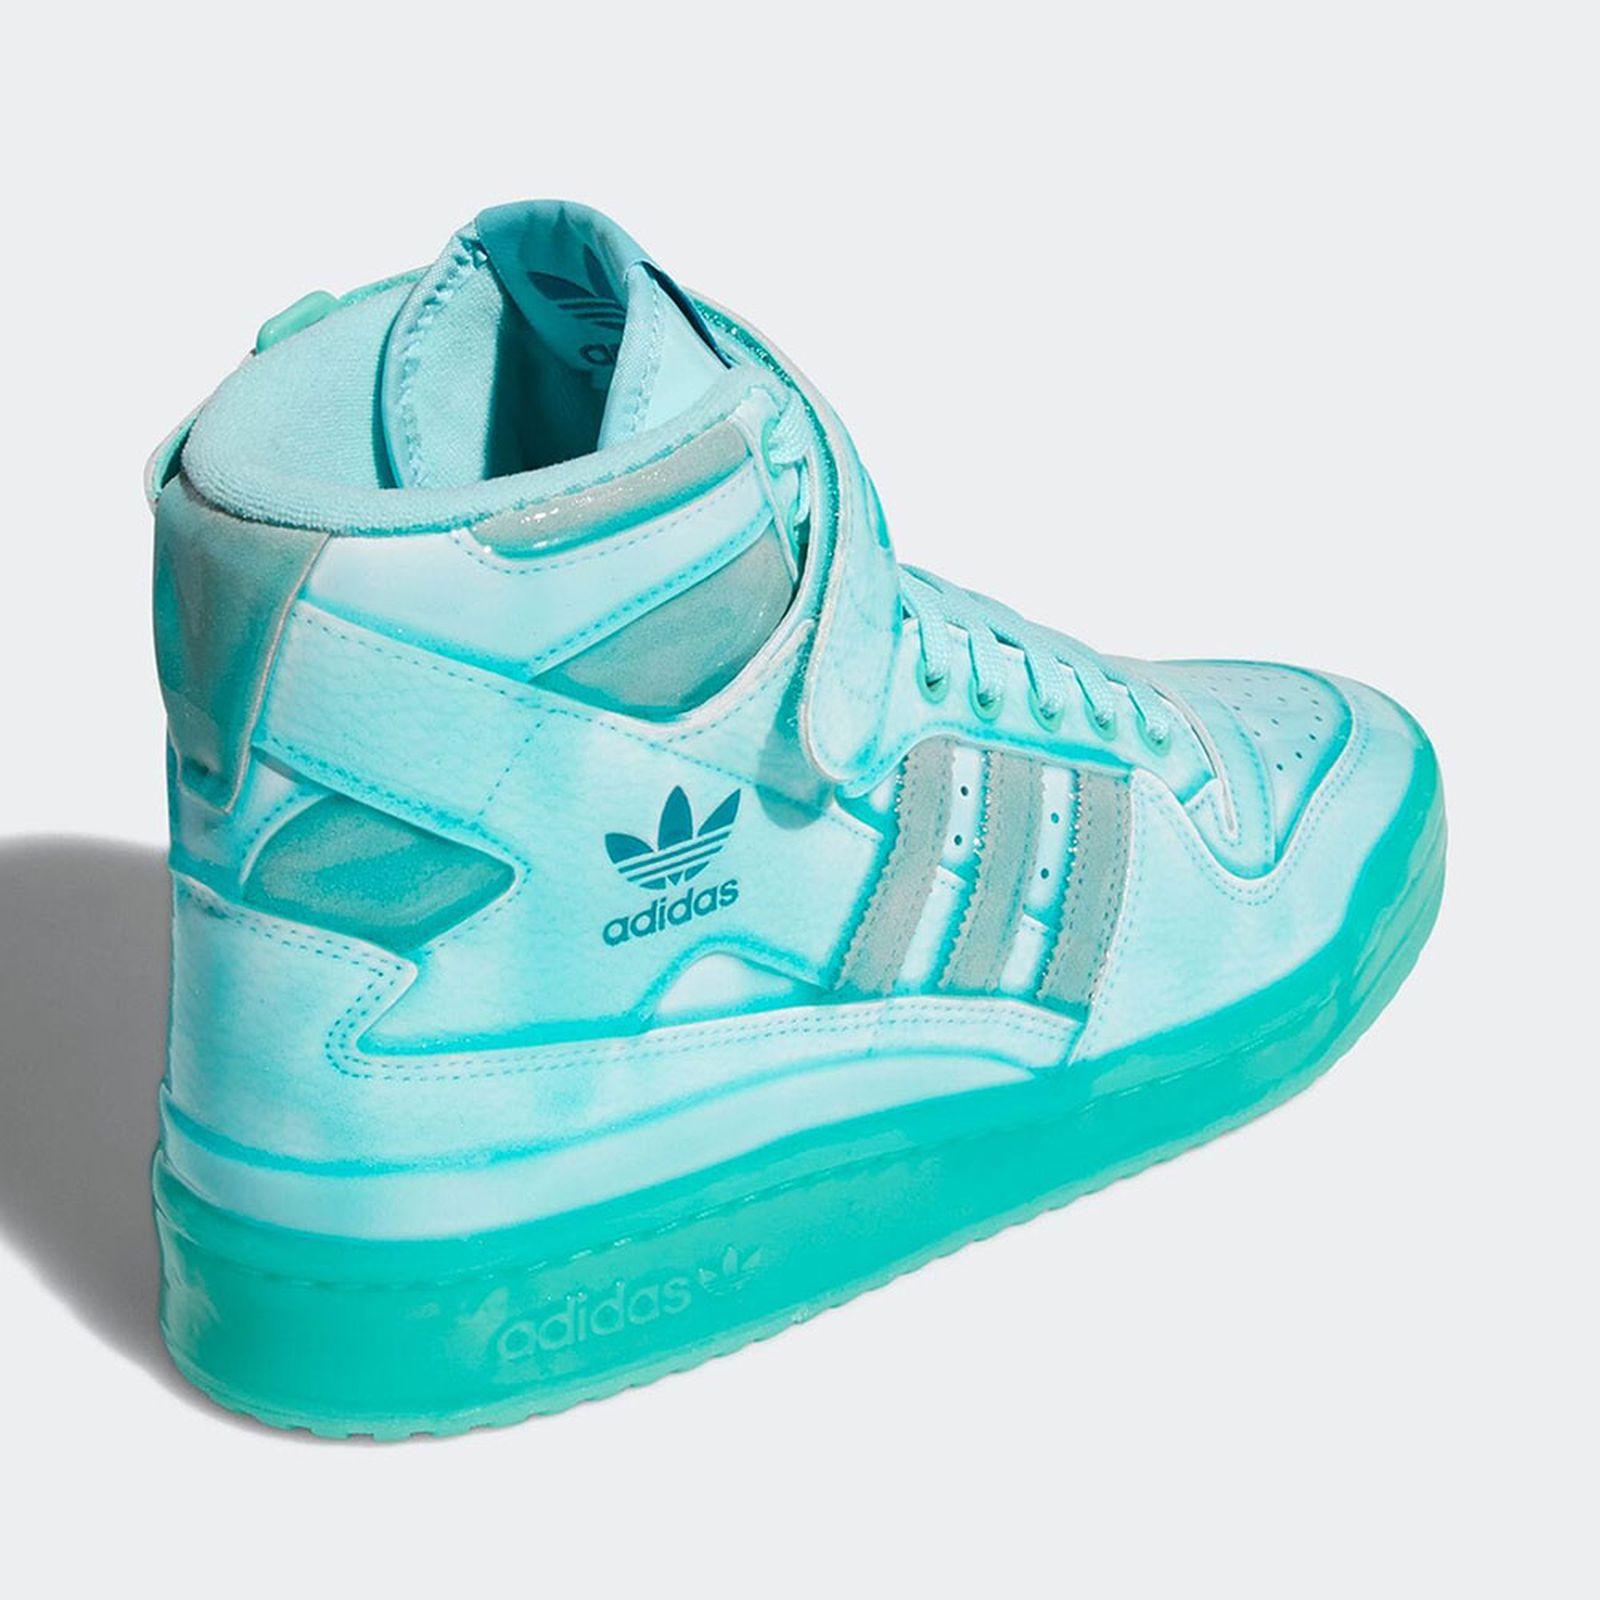 jeremy-scott-adidas-forum-hi-release-date-price-14